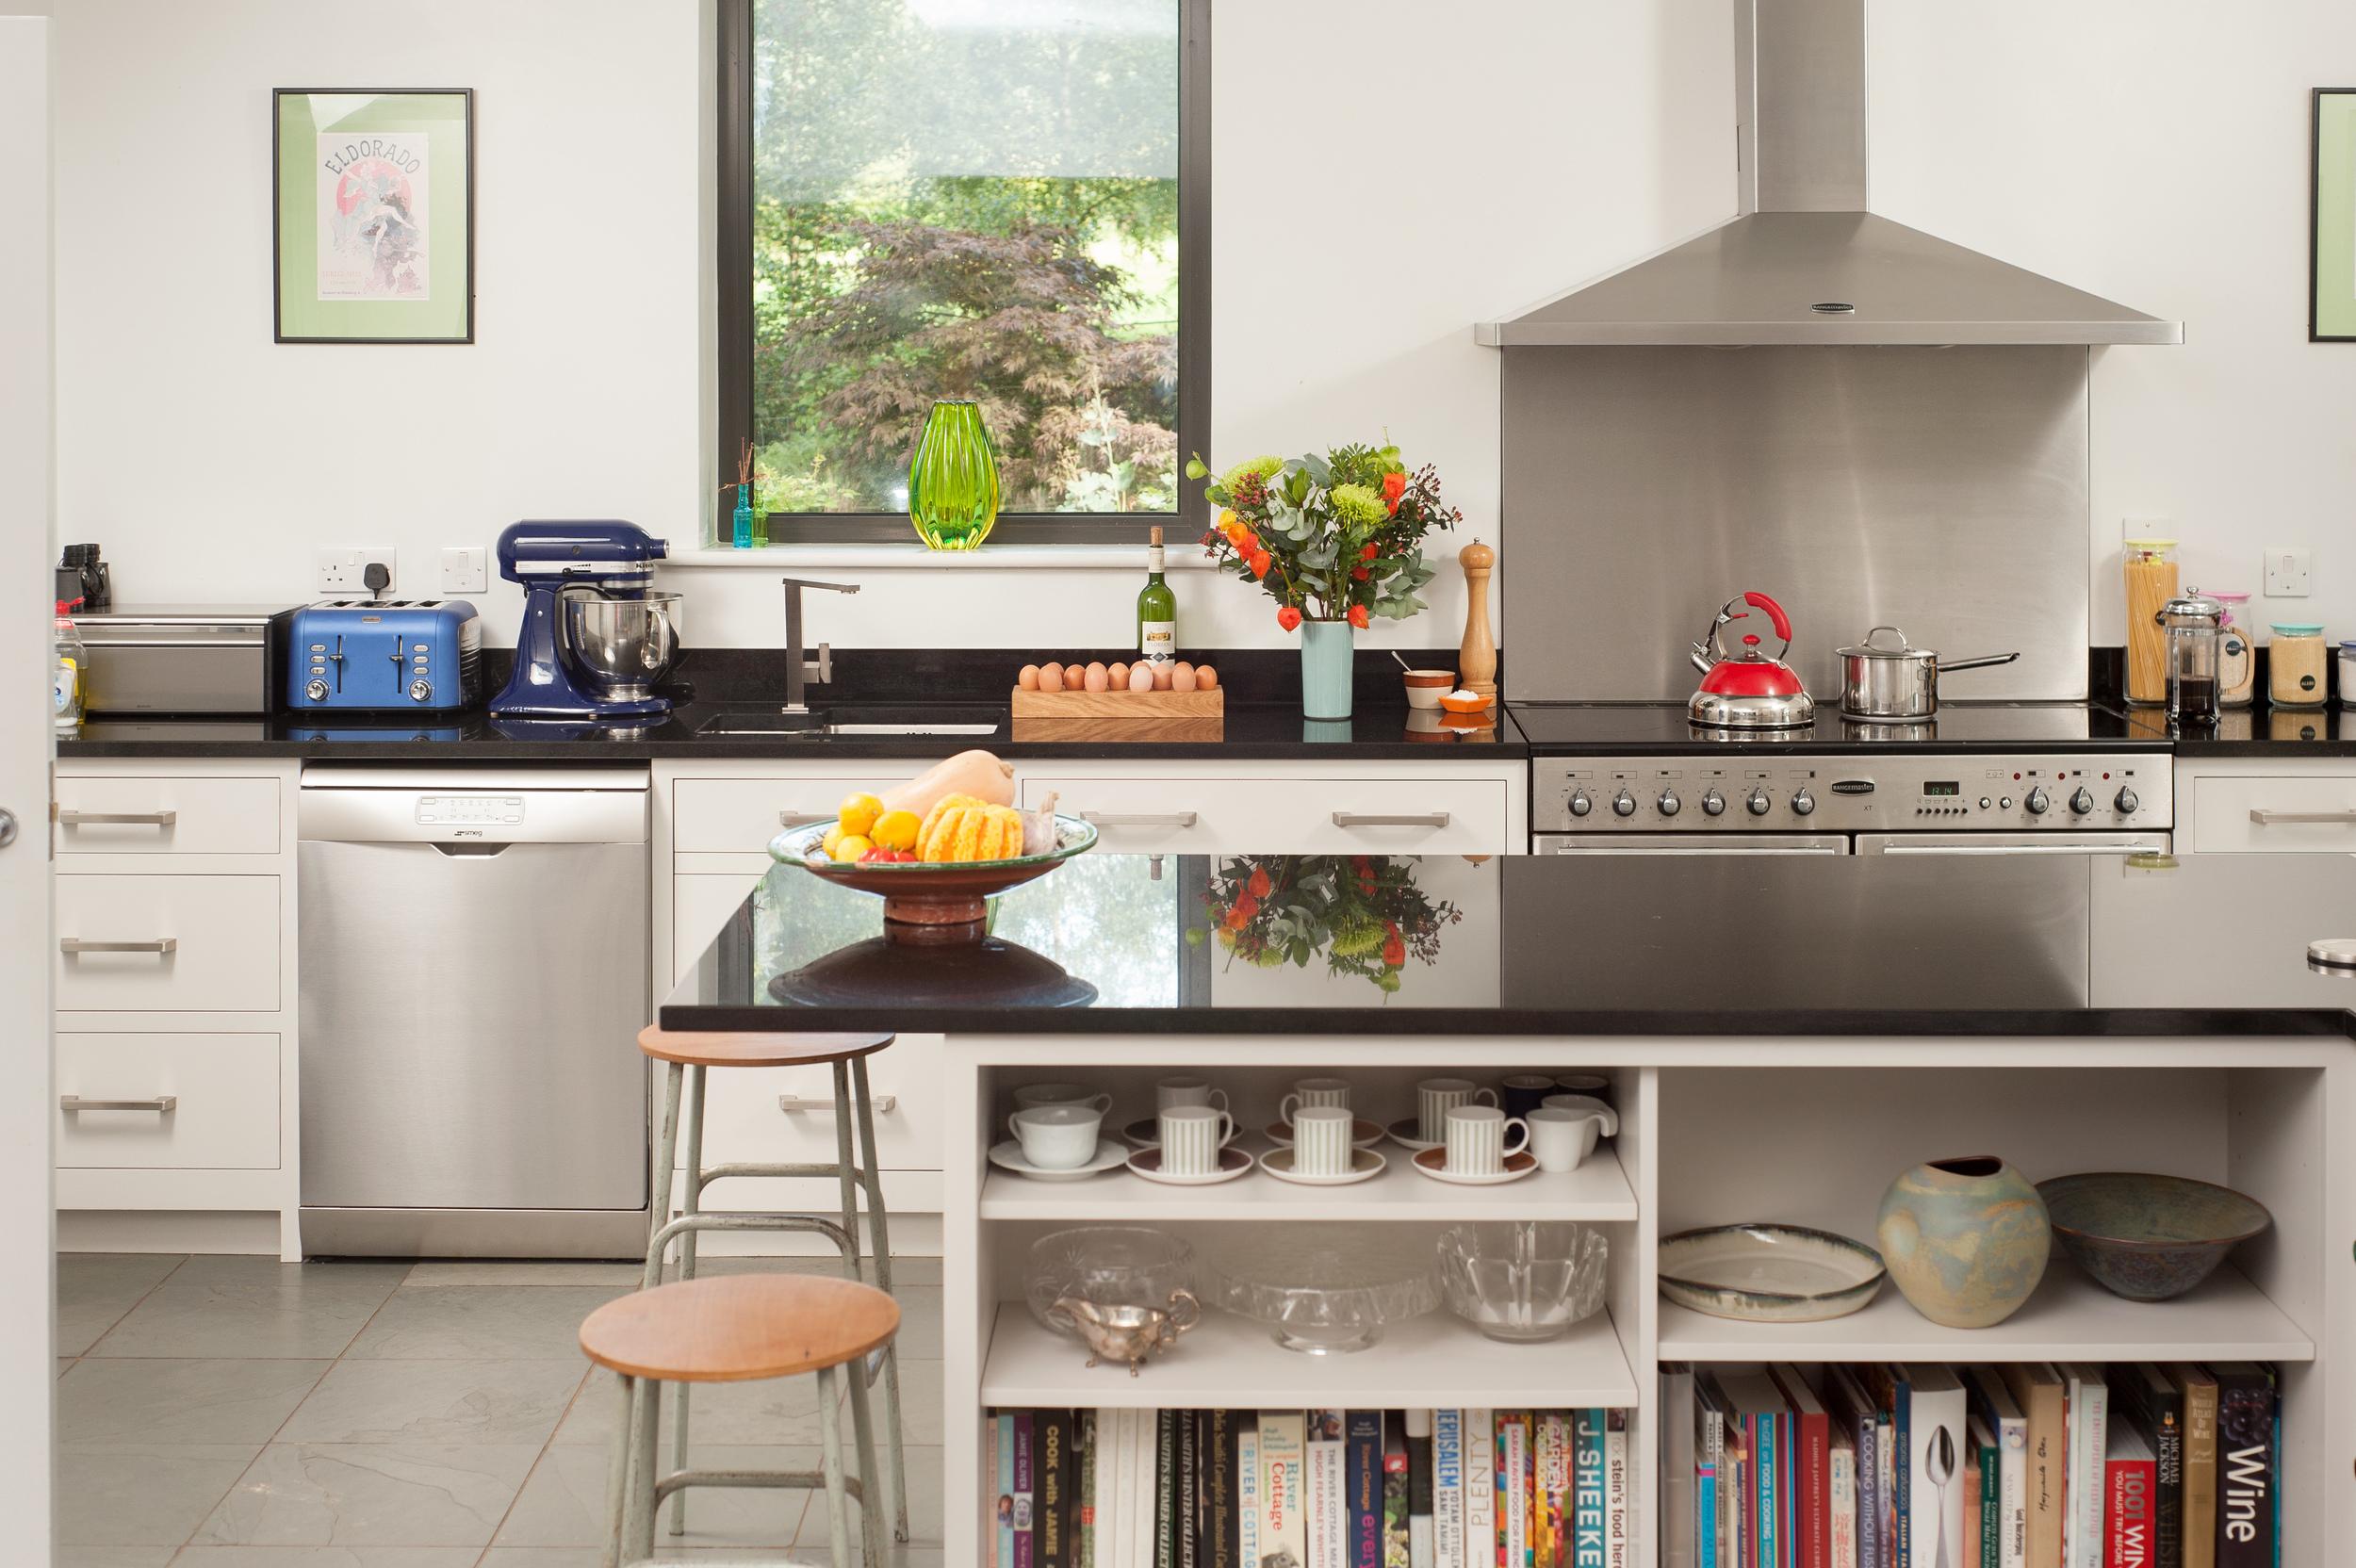 kitchenbookbigpics-0045.jpg